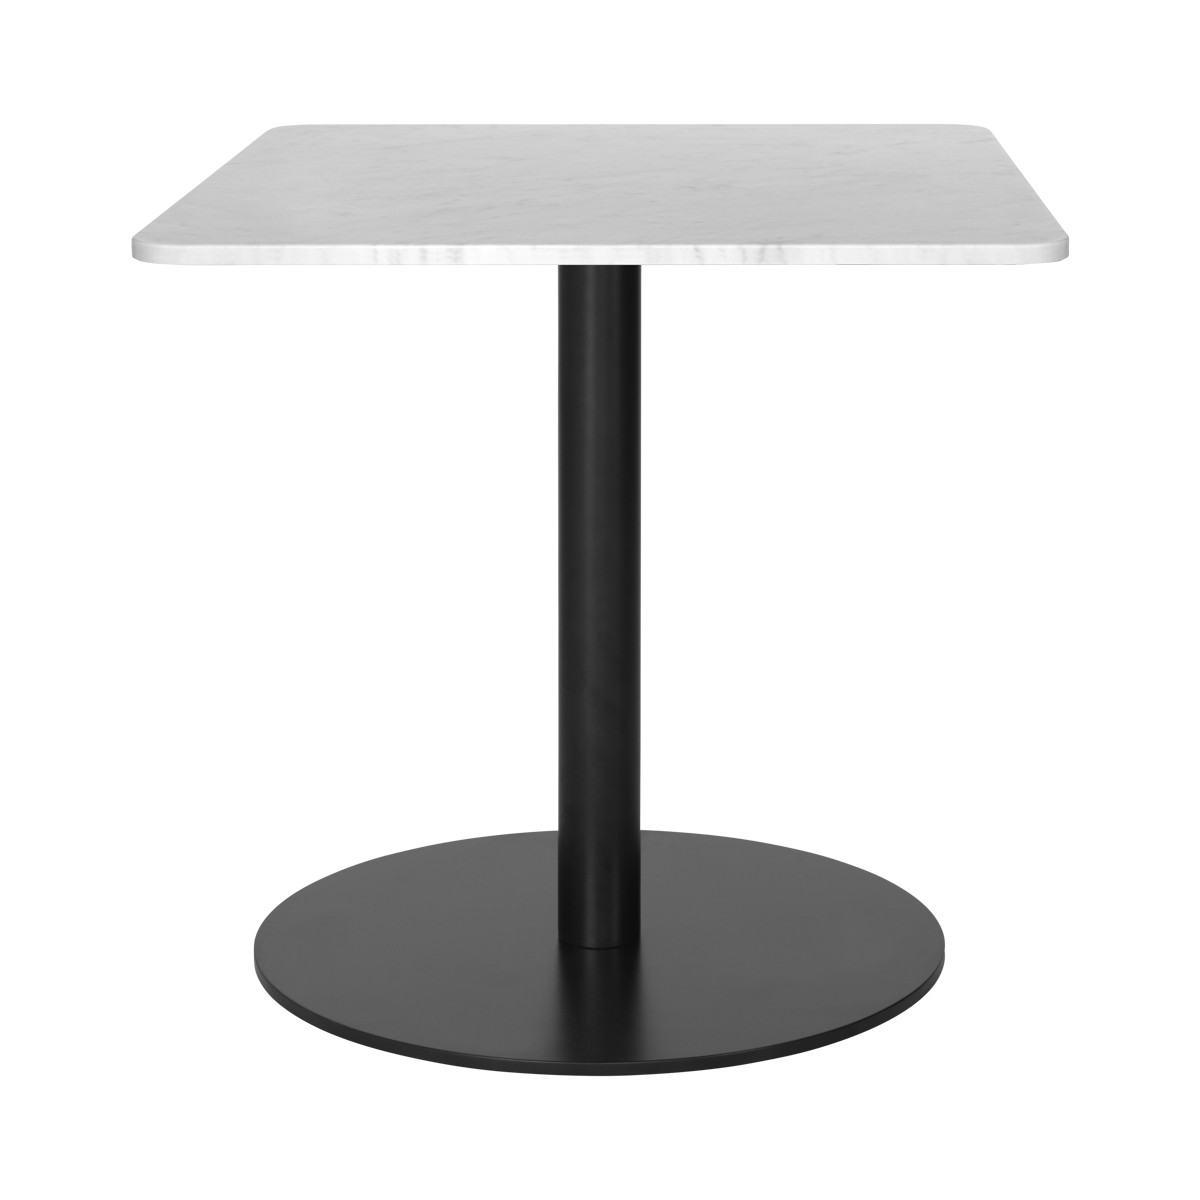 GUBI 1.0 Lounge Table - Square - 60x60